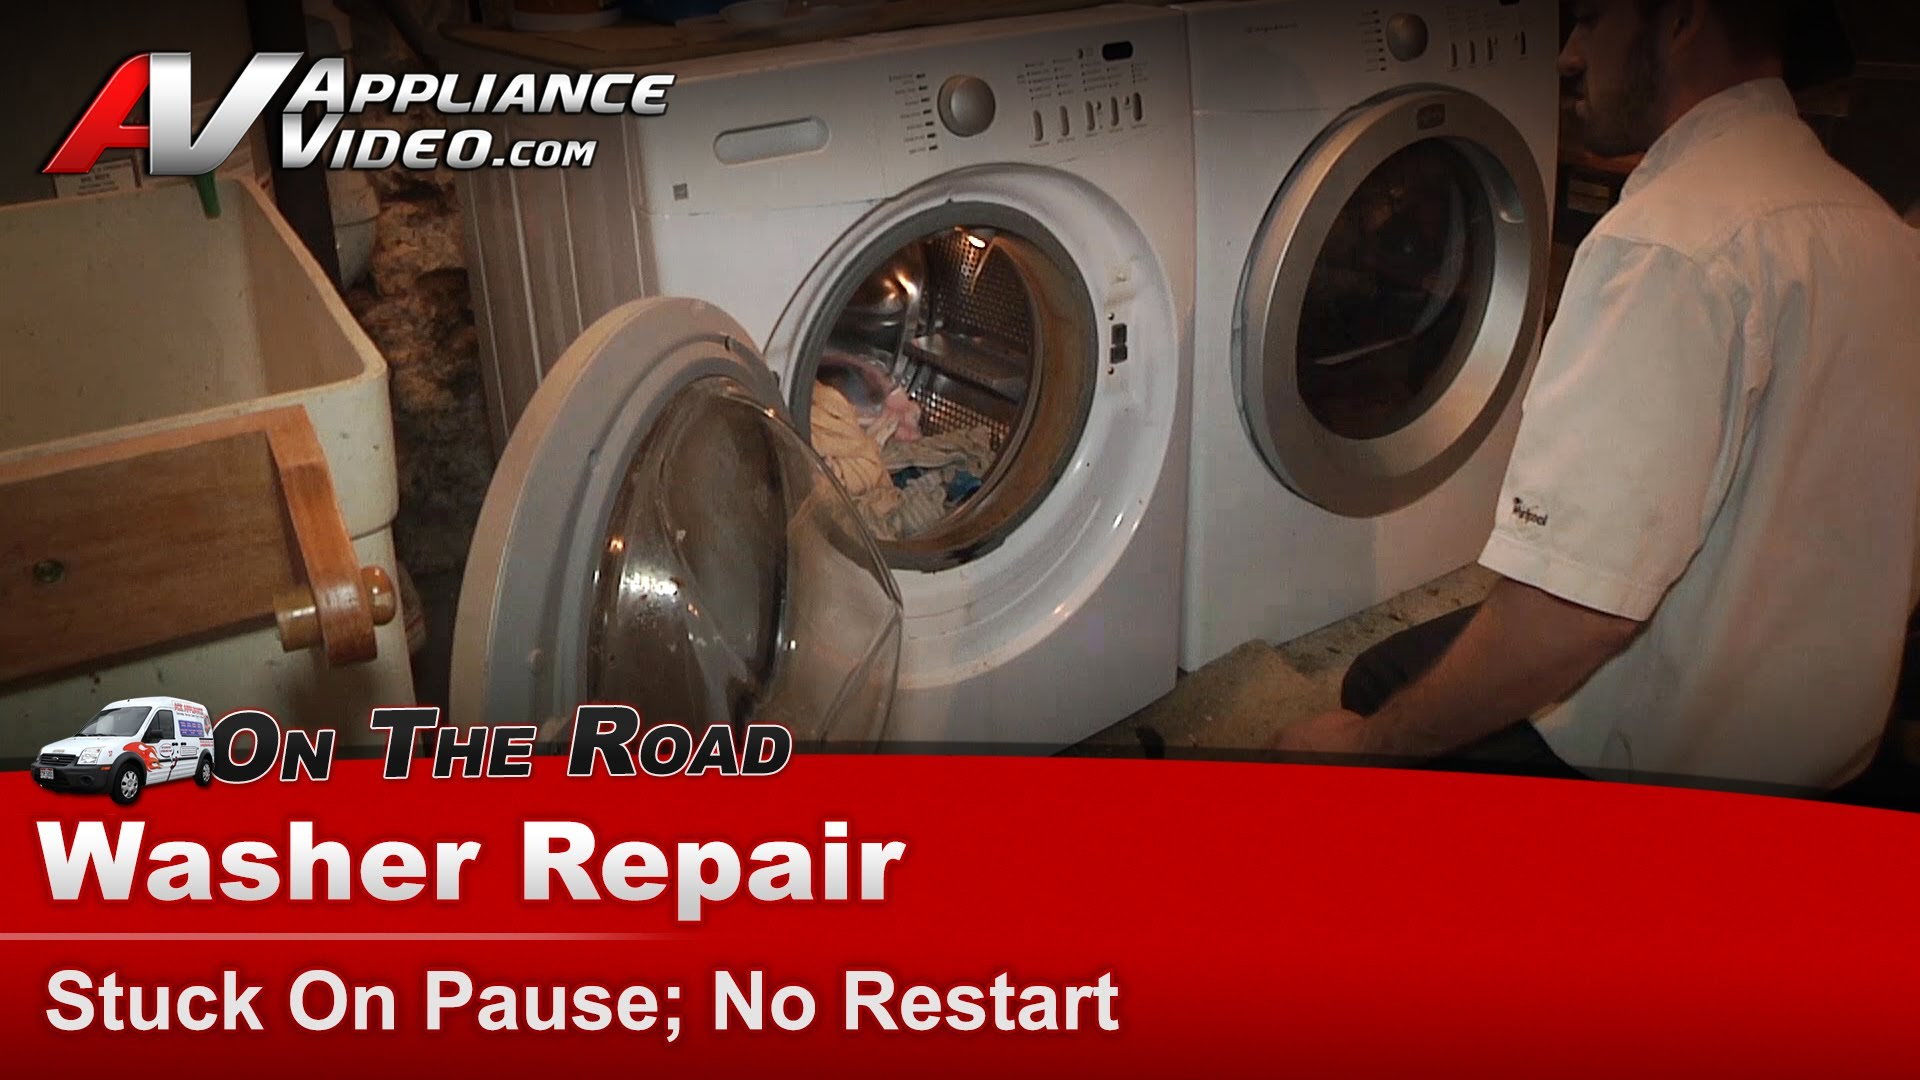 Frigidaire ATF7000FS1 Washer Repair – Stuck on pause, no restart – Door  Lock | Appliance Video